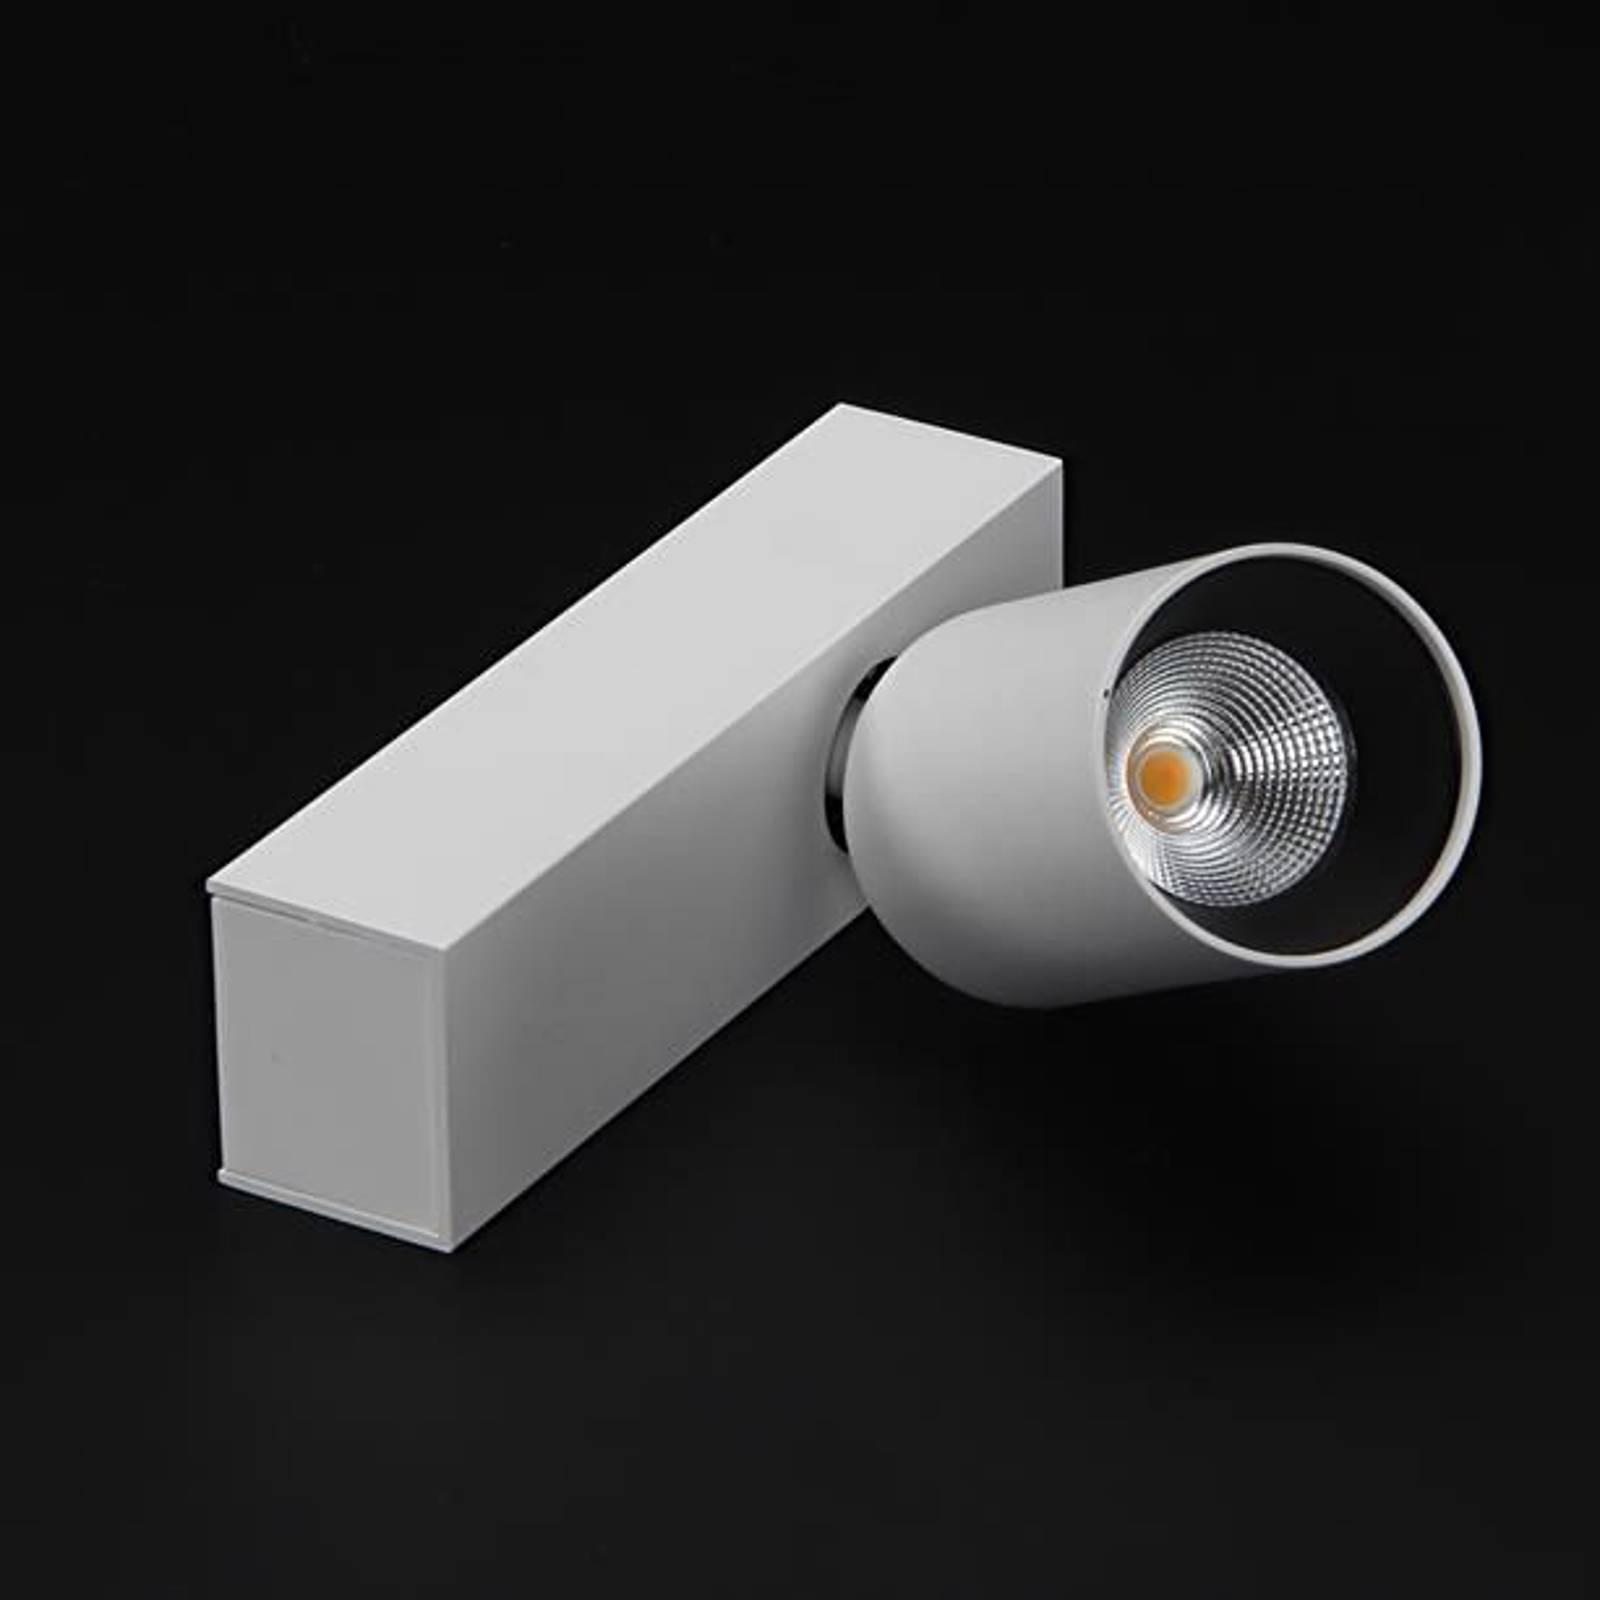 LED-Deckenstrahler Klara, einflammig